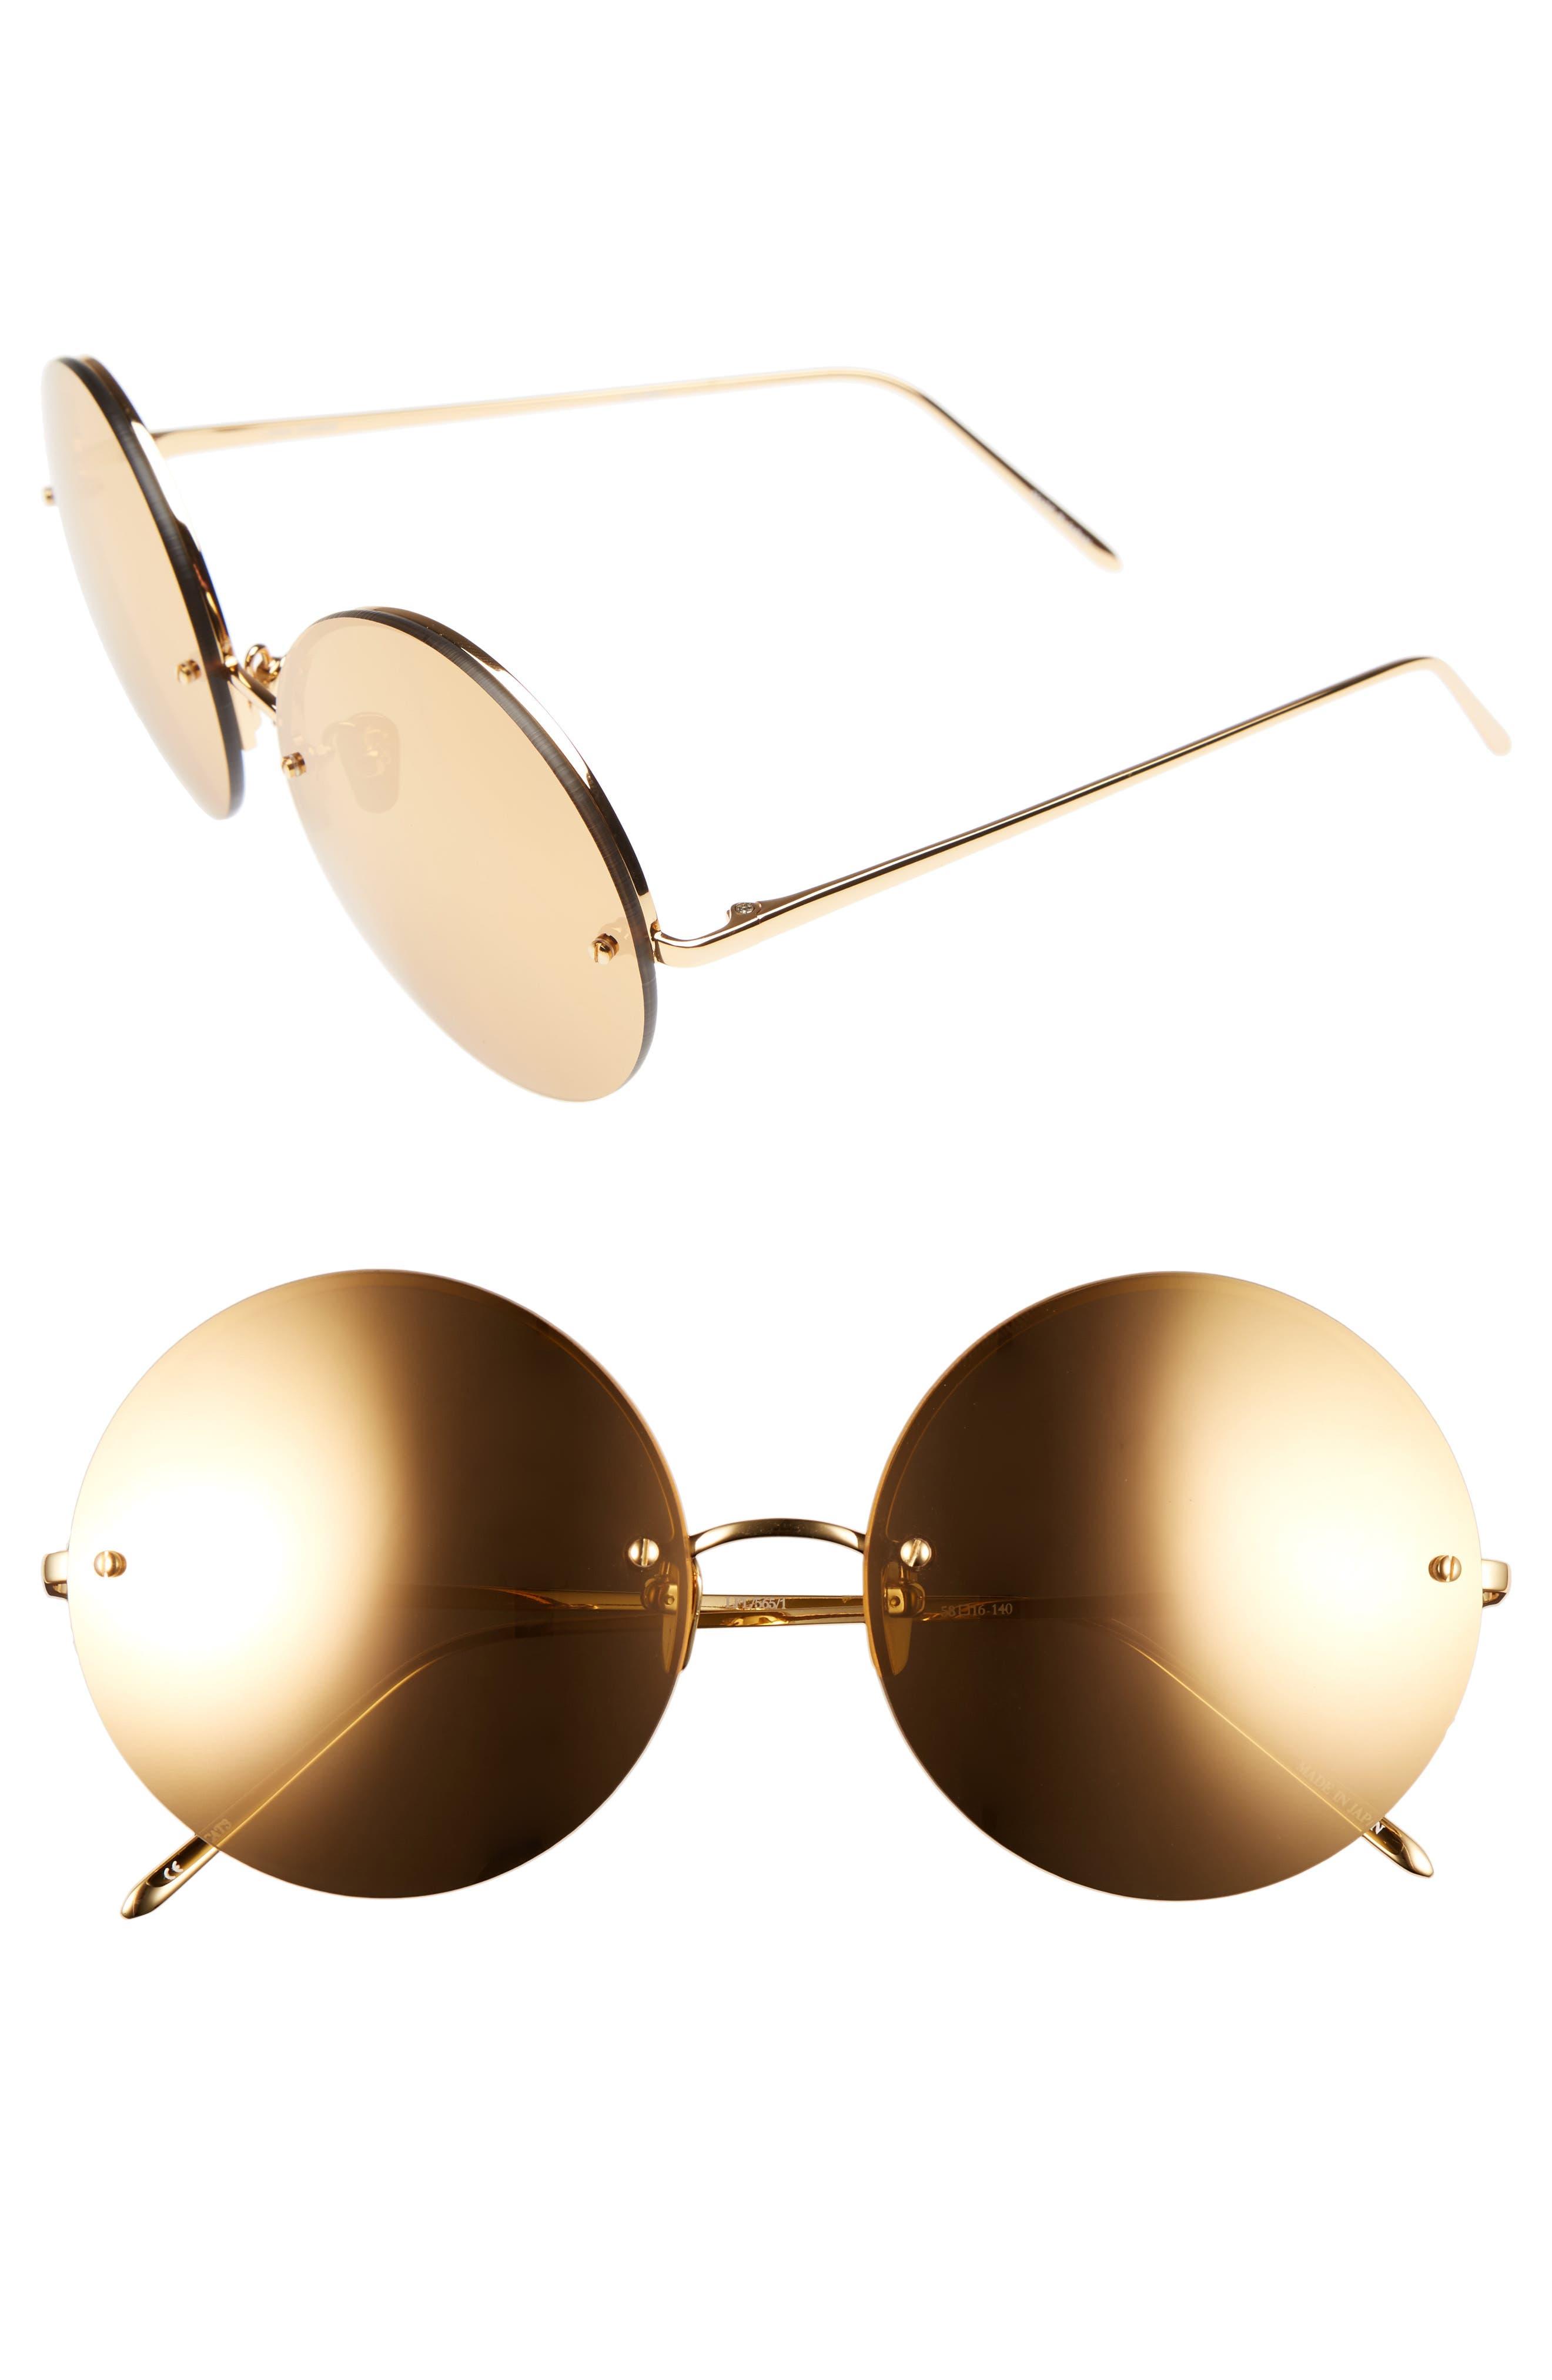 58mm 22 Karat Gold Trim Rimless Round Sunglasses,                         Main,                         color,